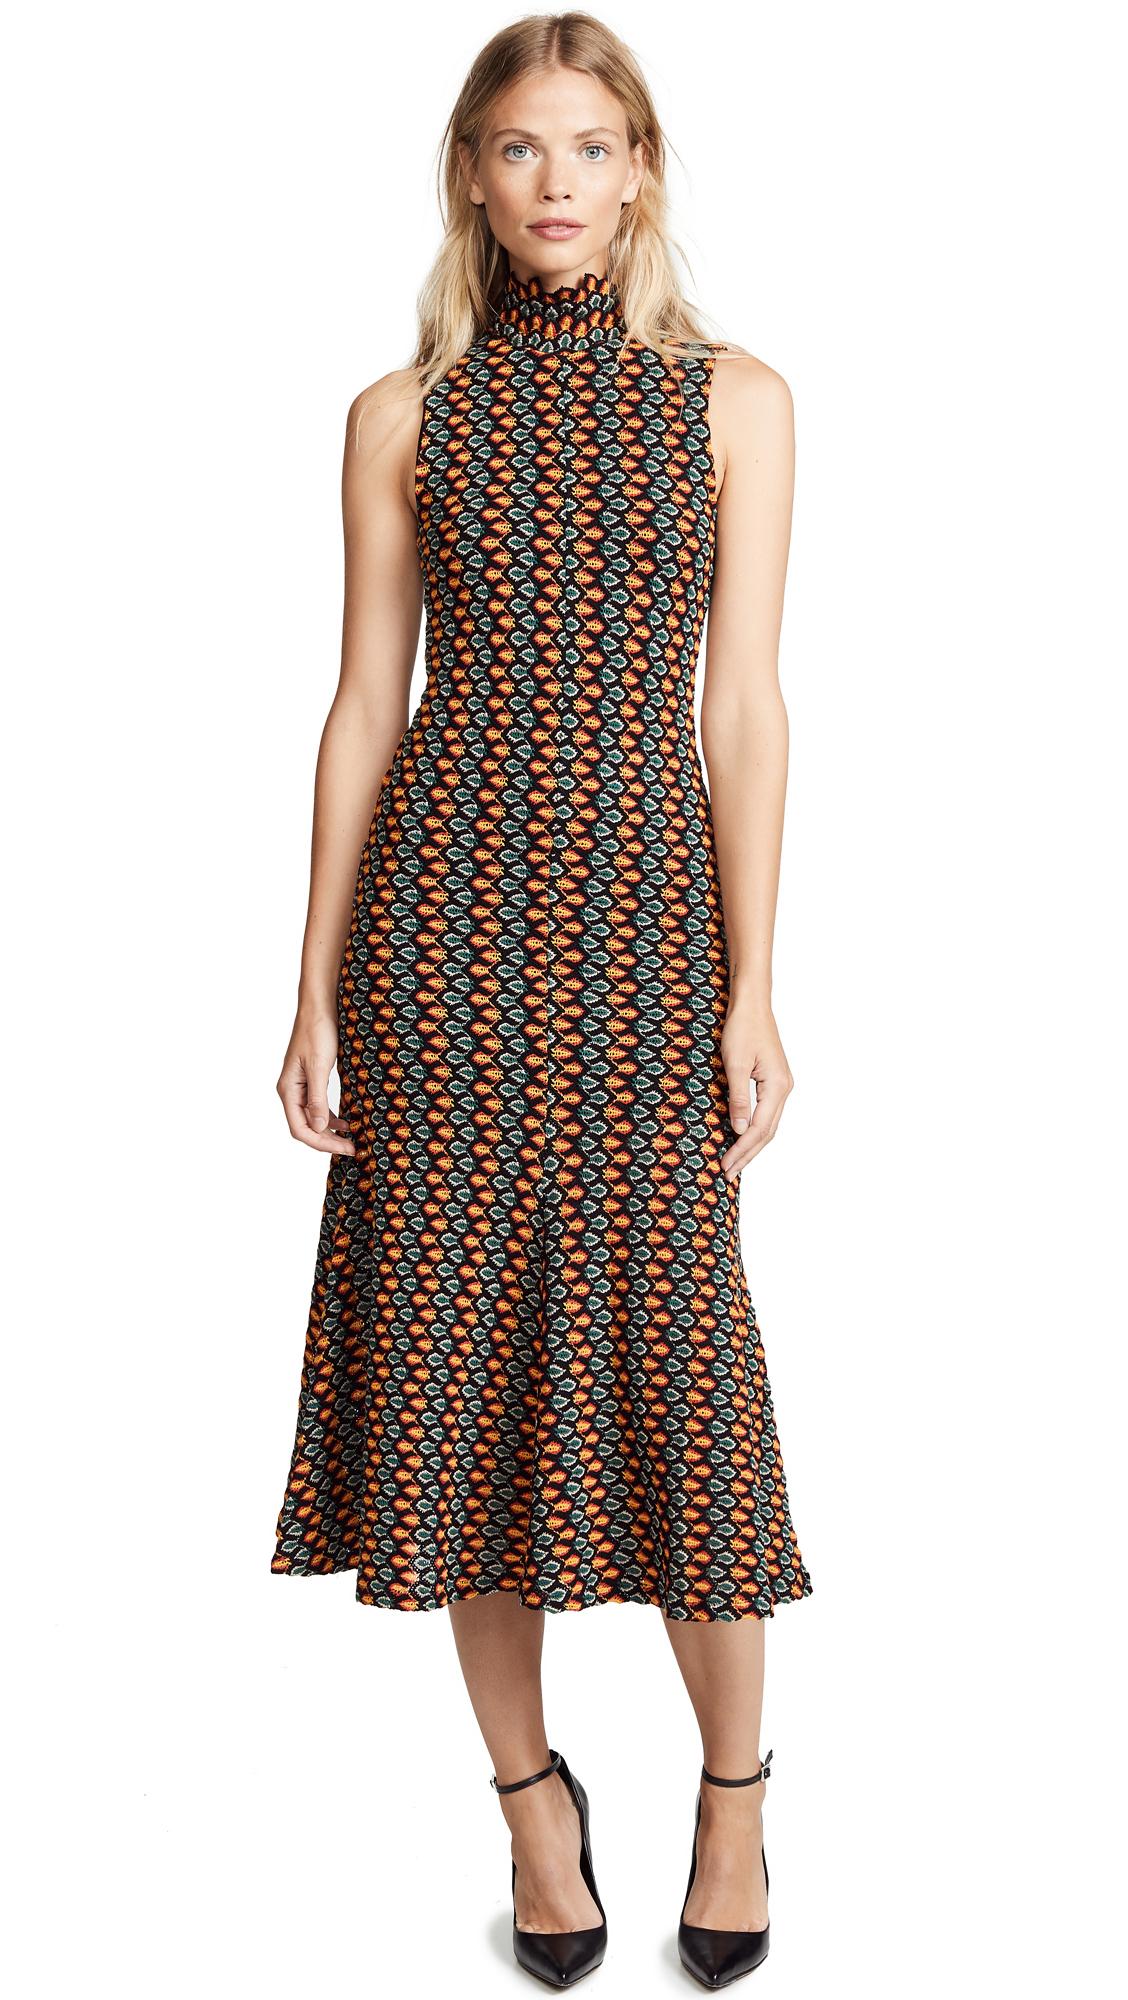 BEAUFILLE Hersilla Sleeveless Crochet Dress in Black